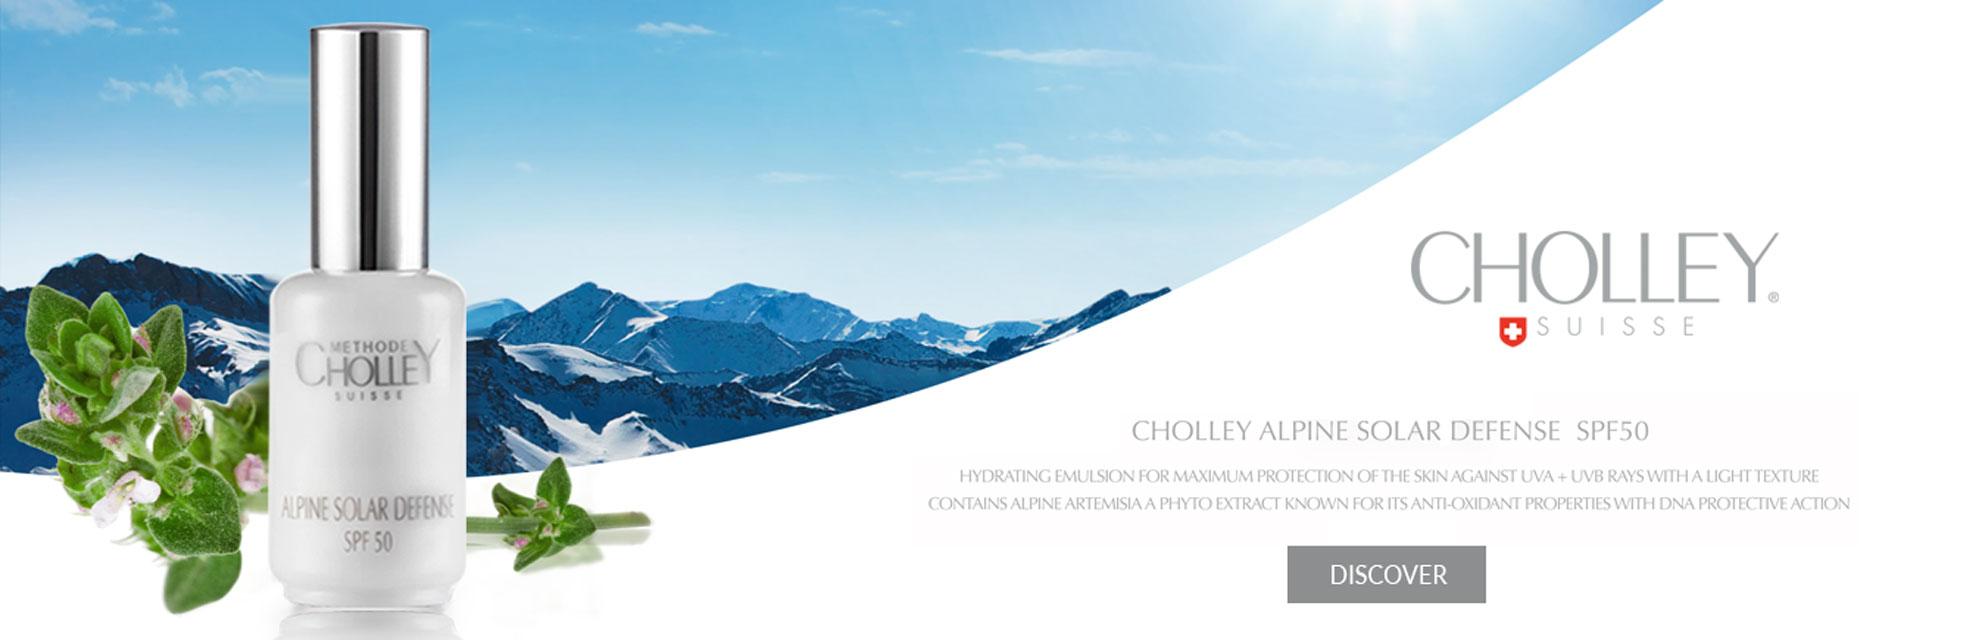 CHOLLEY Alpine Solar Defense SPF50